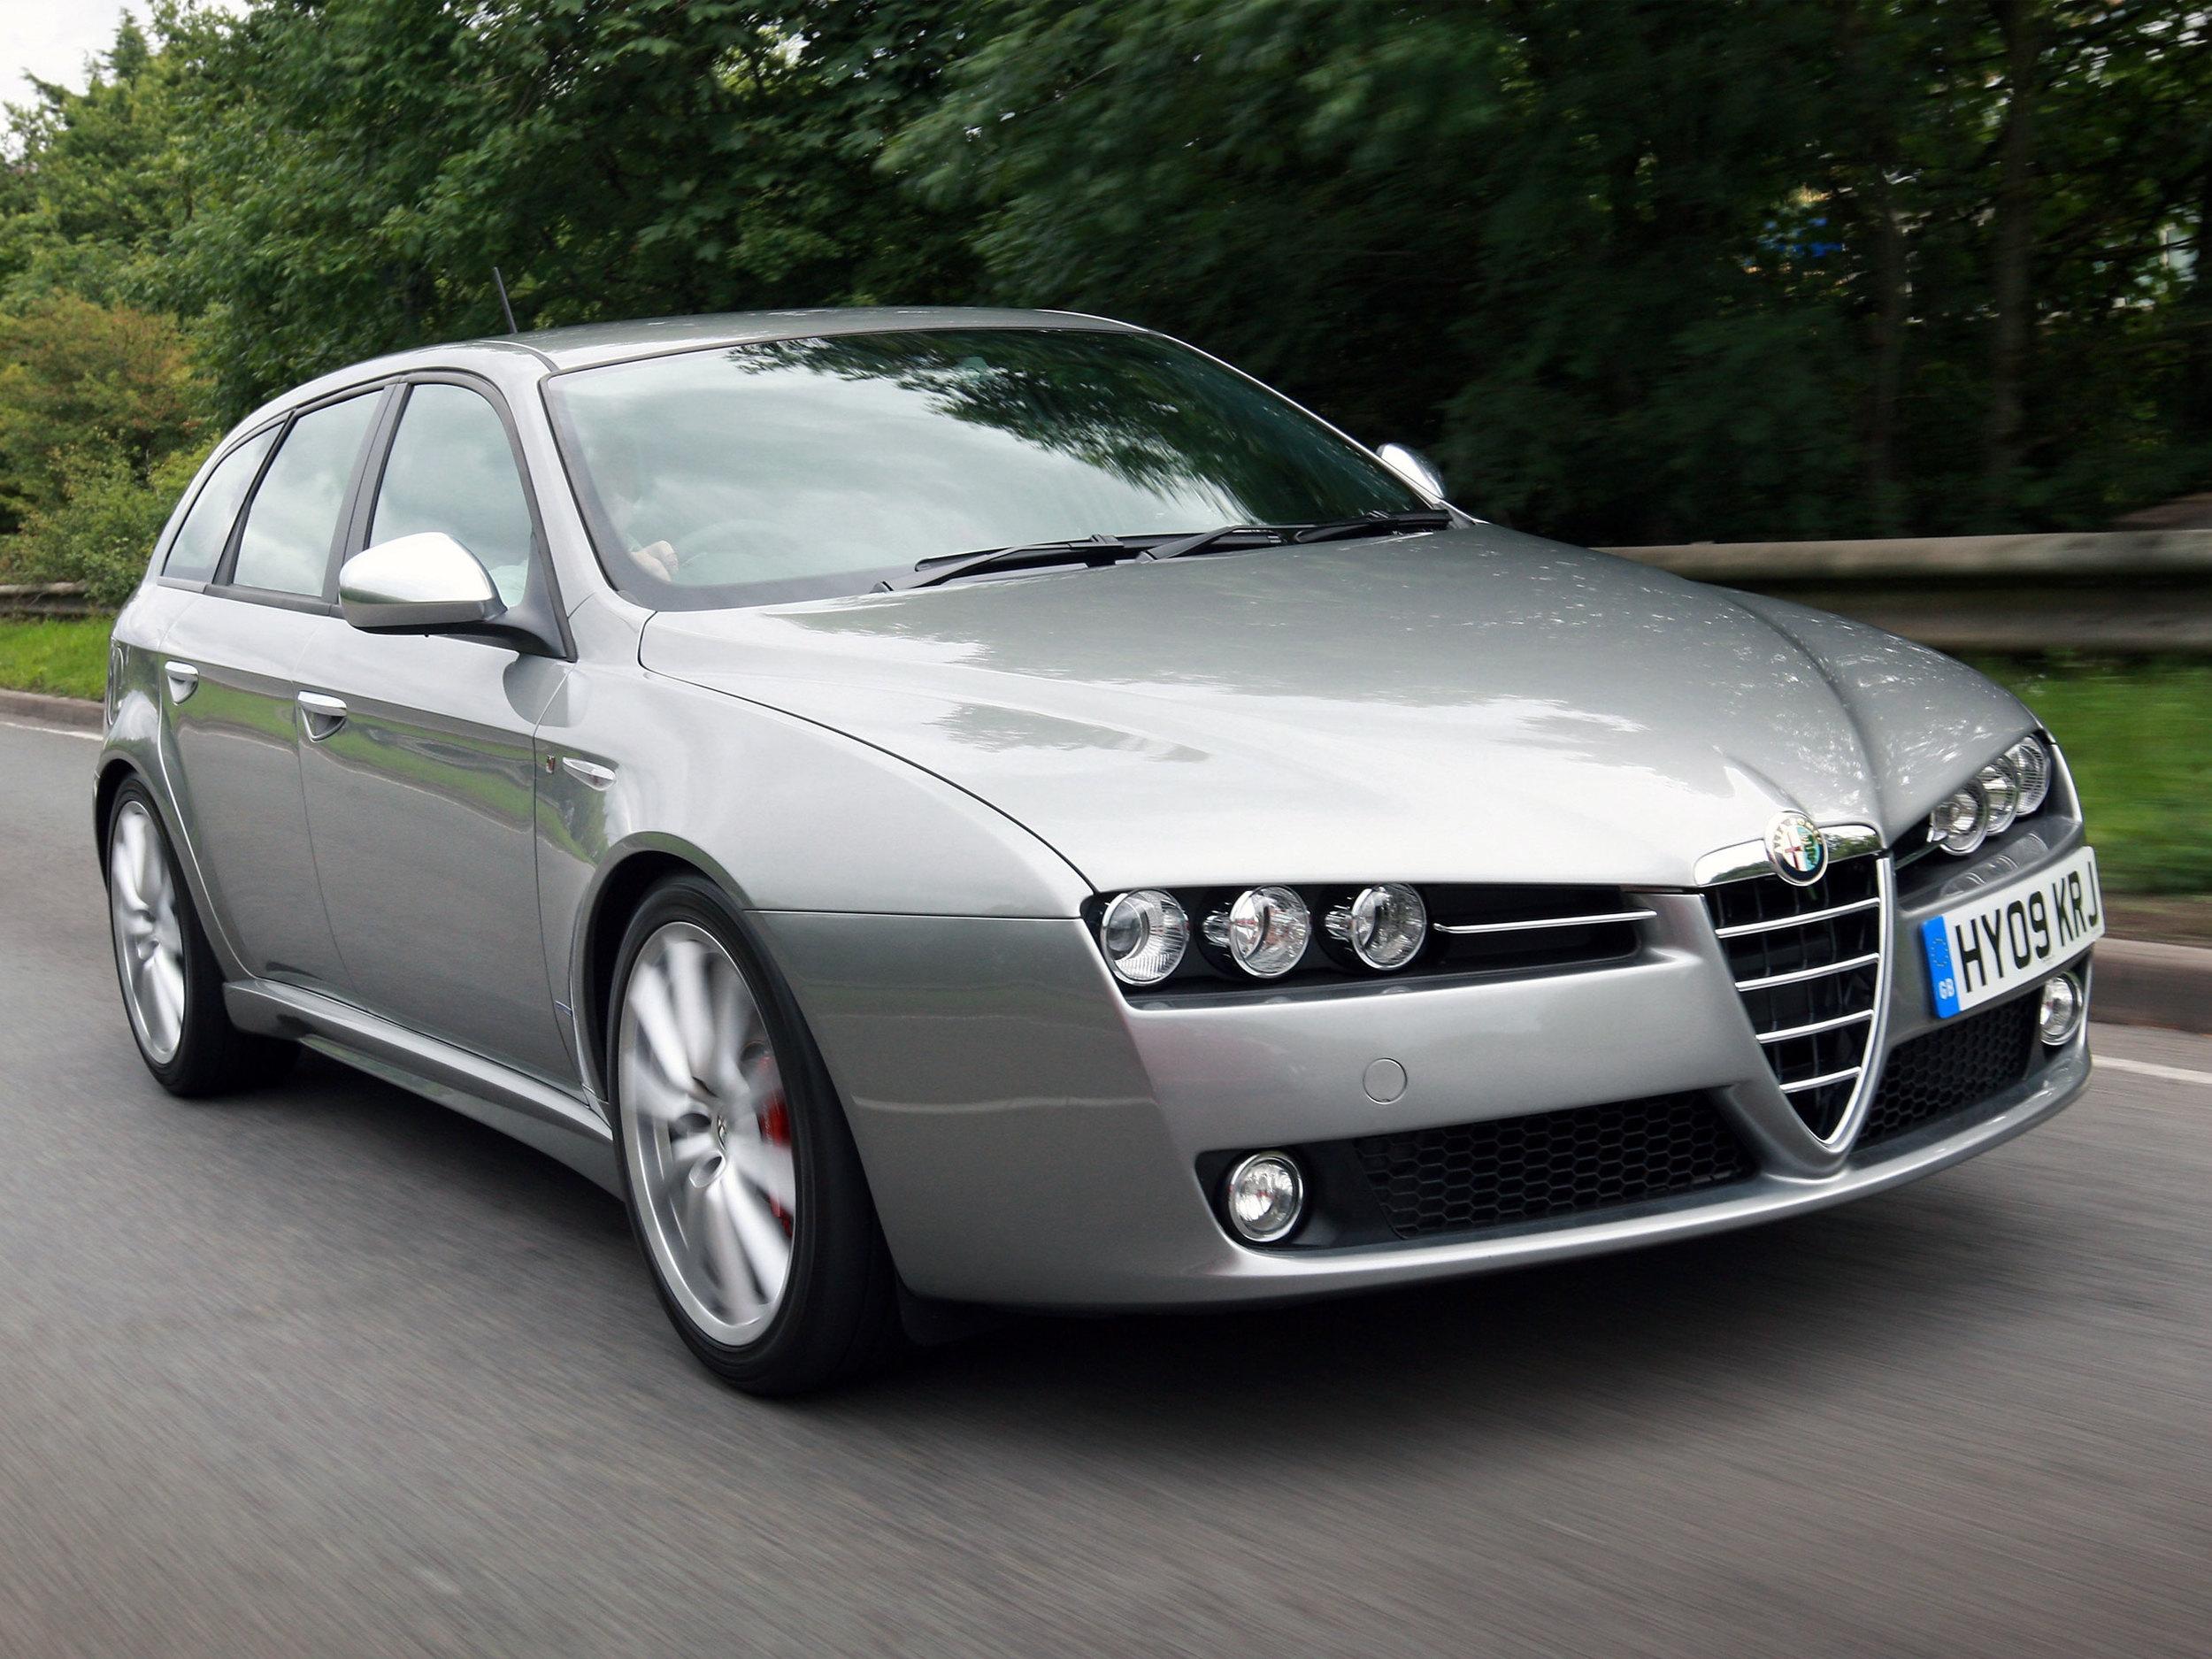 Alfa Romeo 159 (2006-2012)